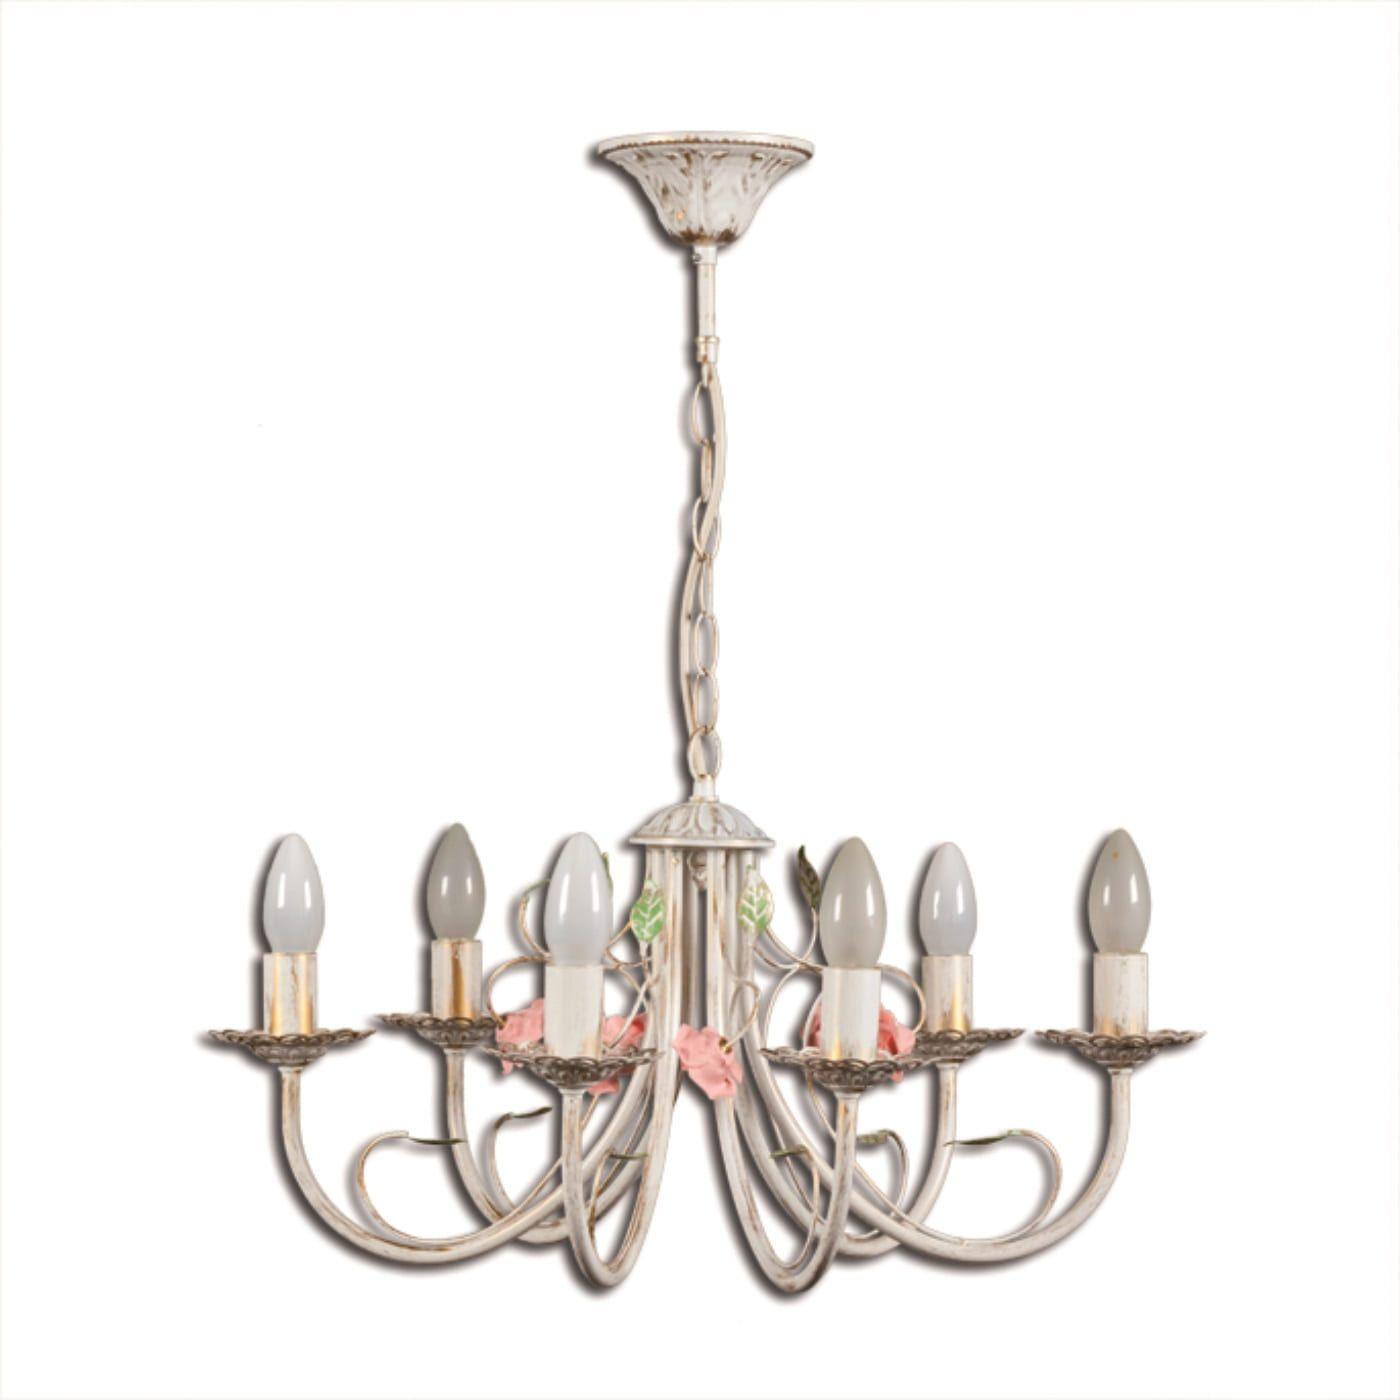 PETRASVET / Pendant chandelier S1017-6, 6xE14 max. 60W